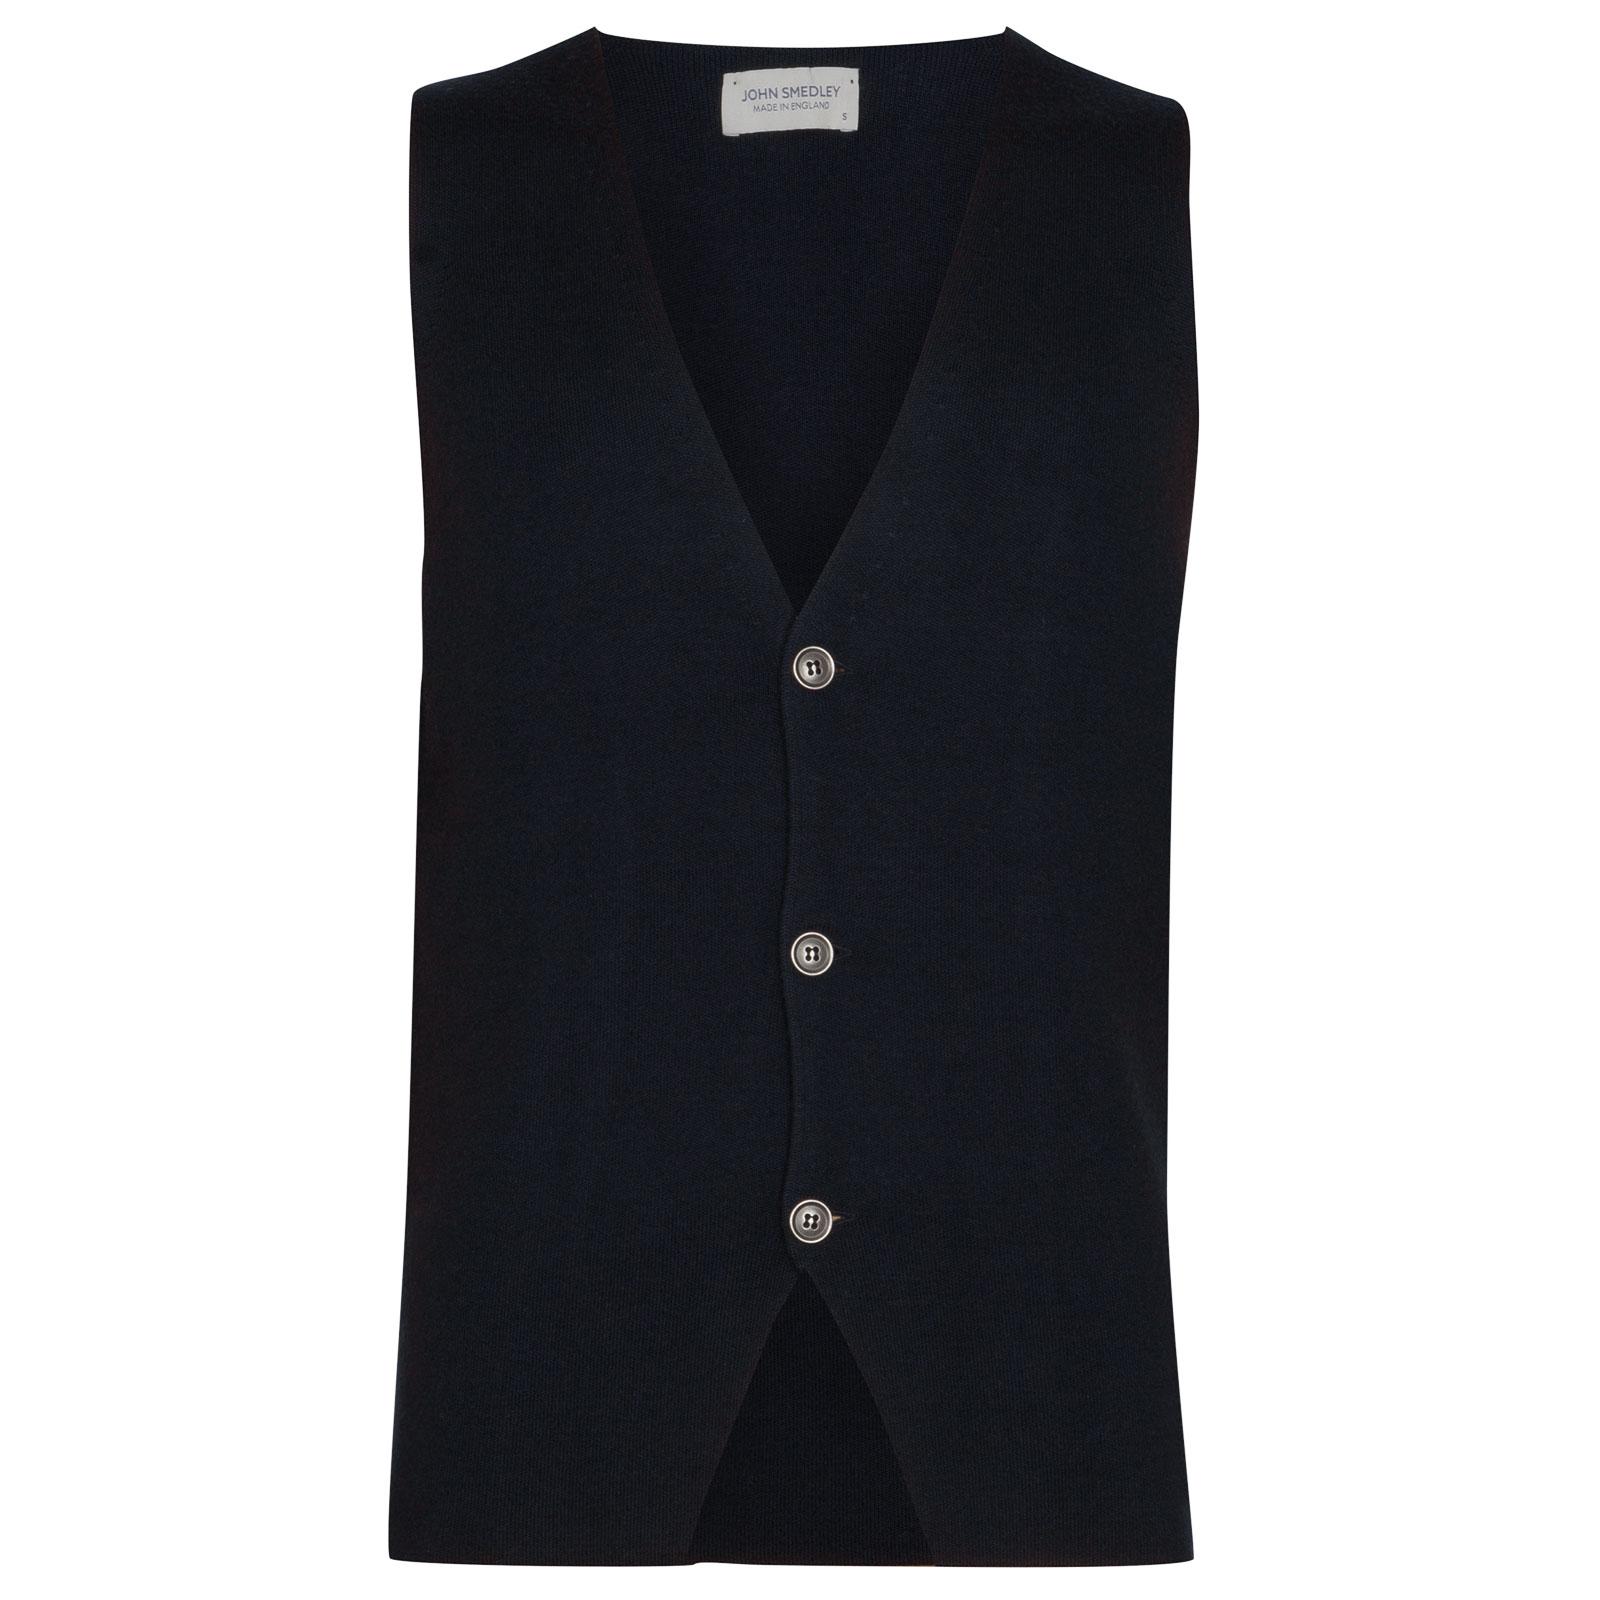 John Smedley Telford Merino Wool Waistcoat in Midnight-XL